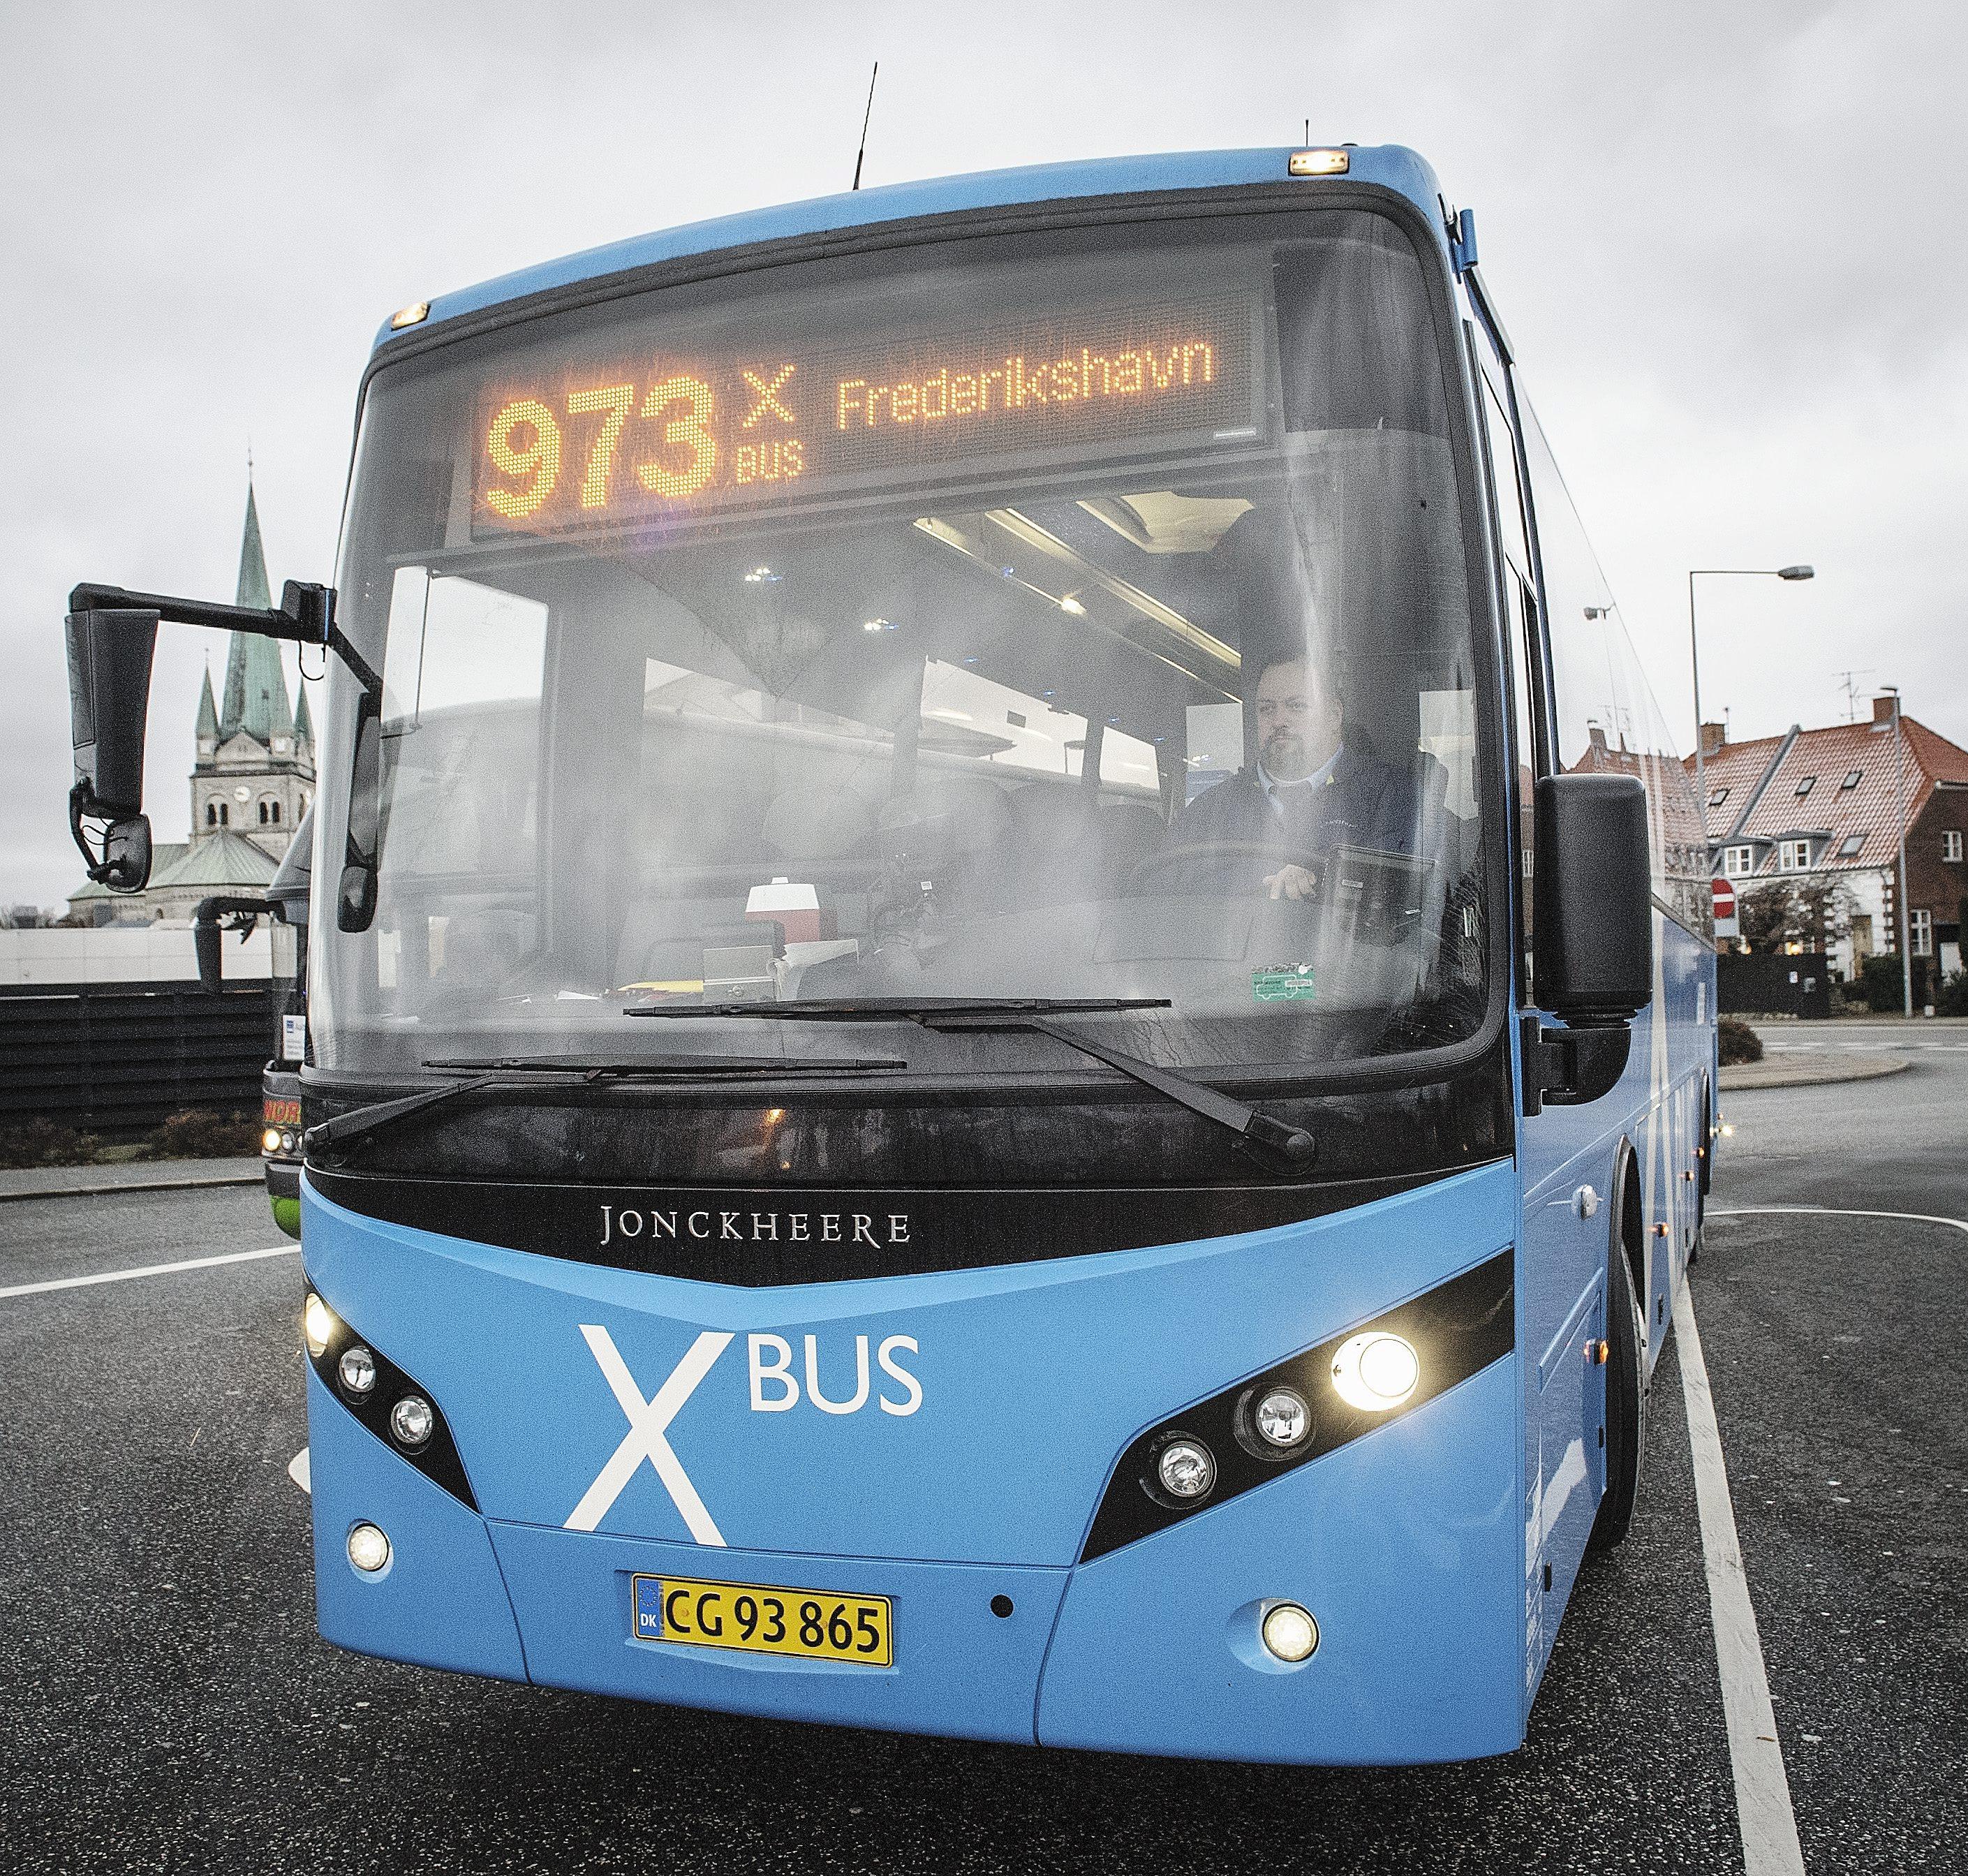 x bus ålborg frederikshavn